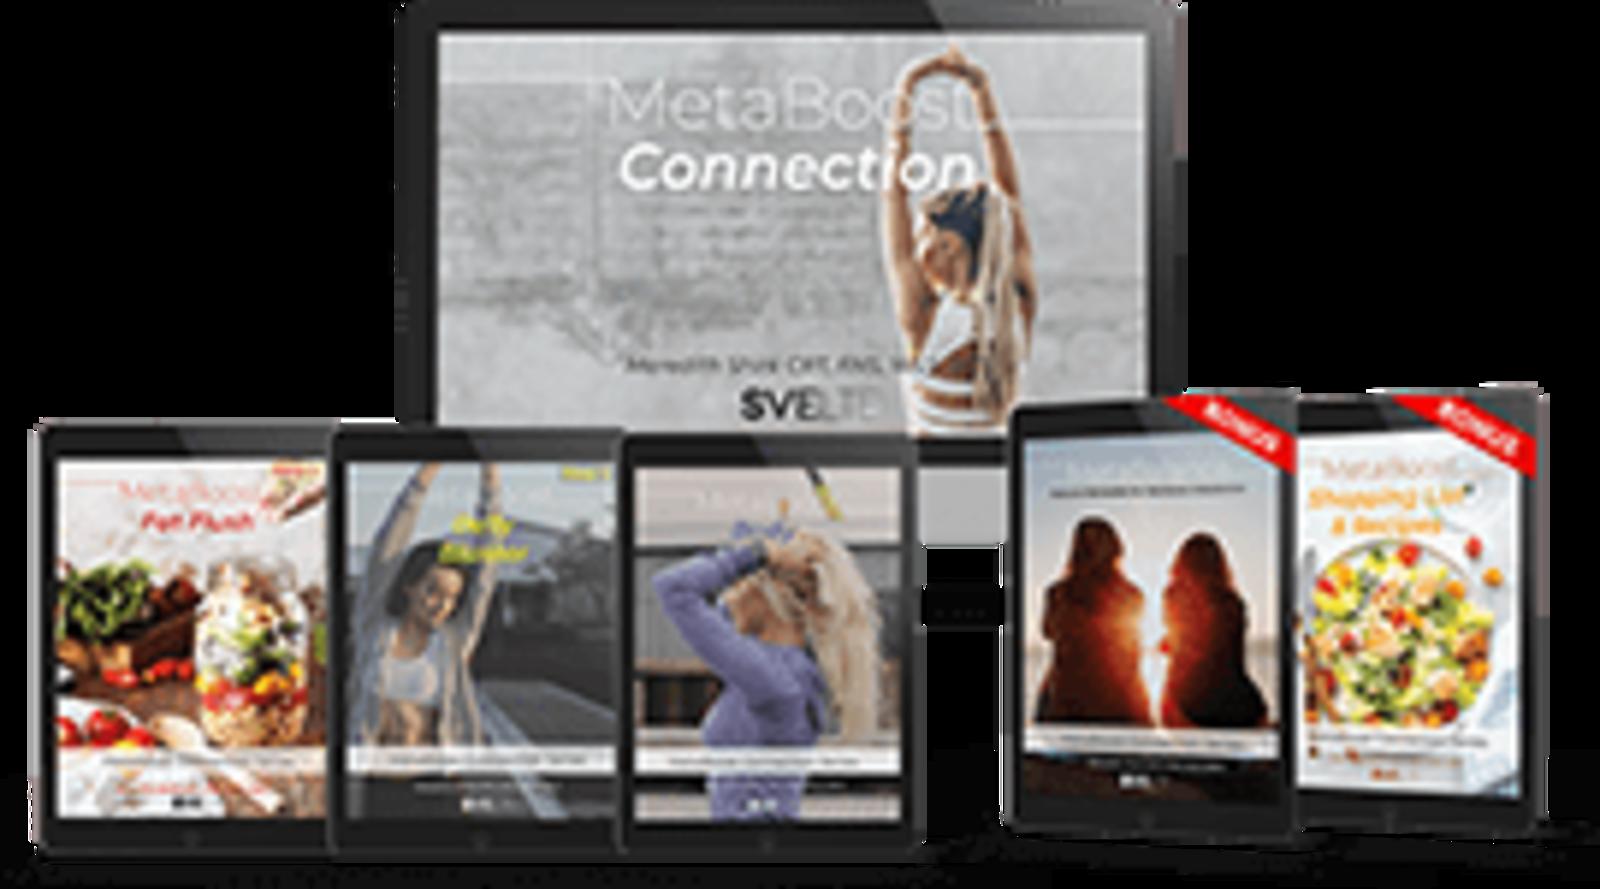 Get Meredith Shirk's MetaBoost program. Metabolism Booster.